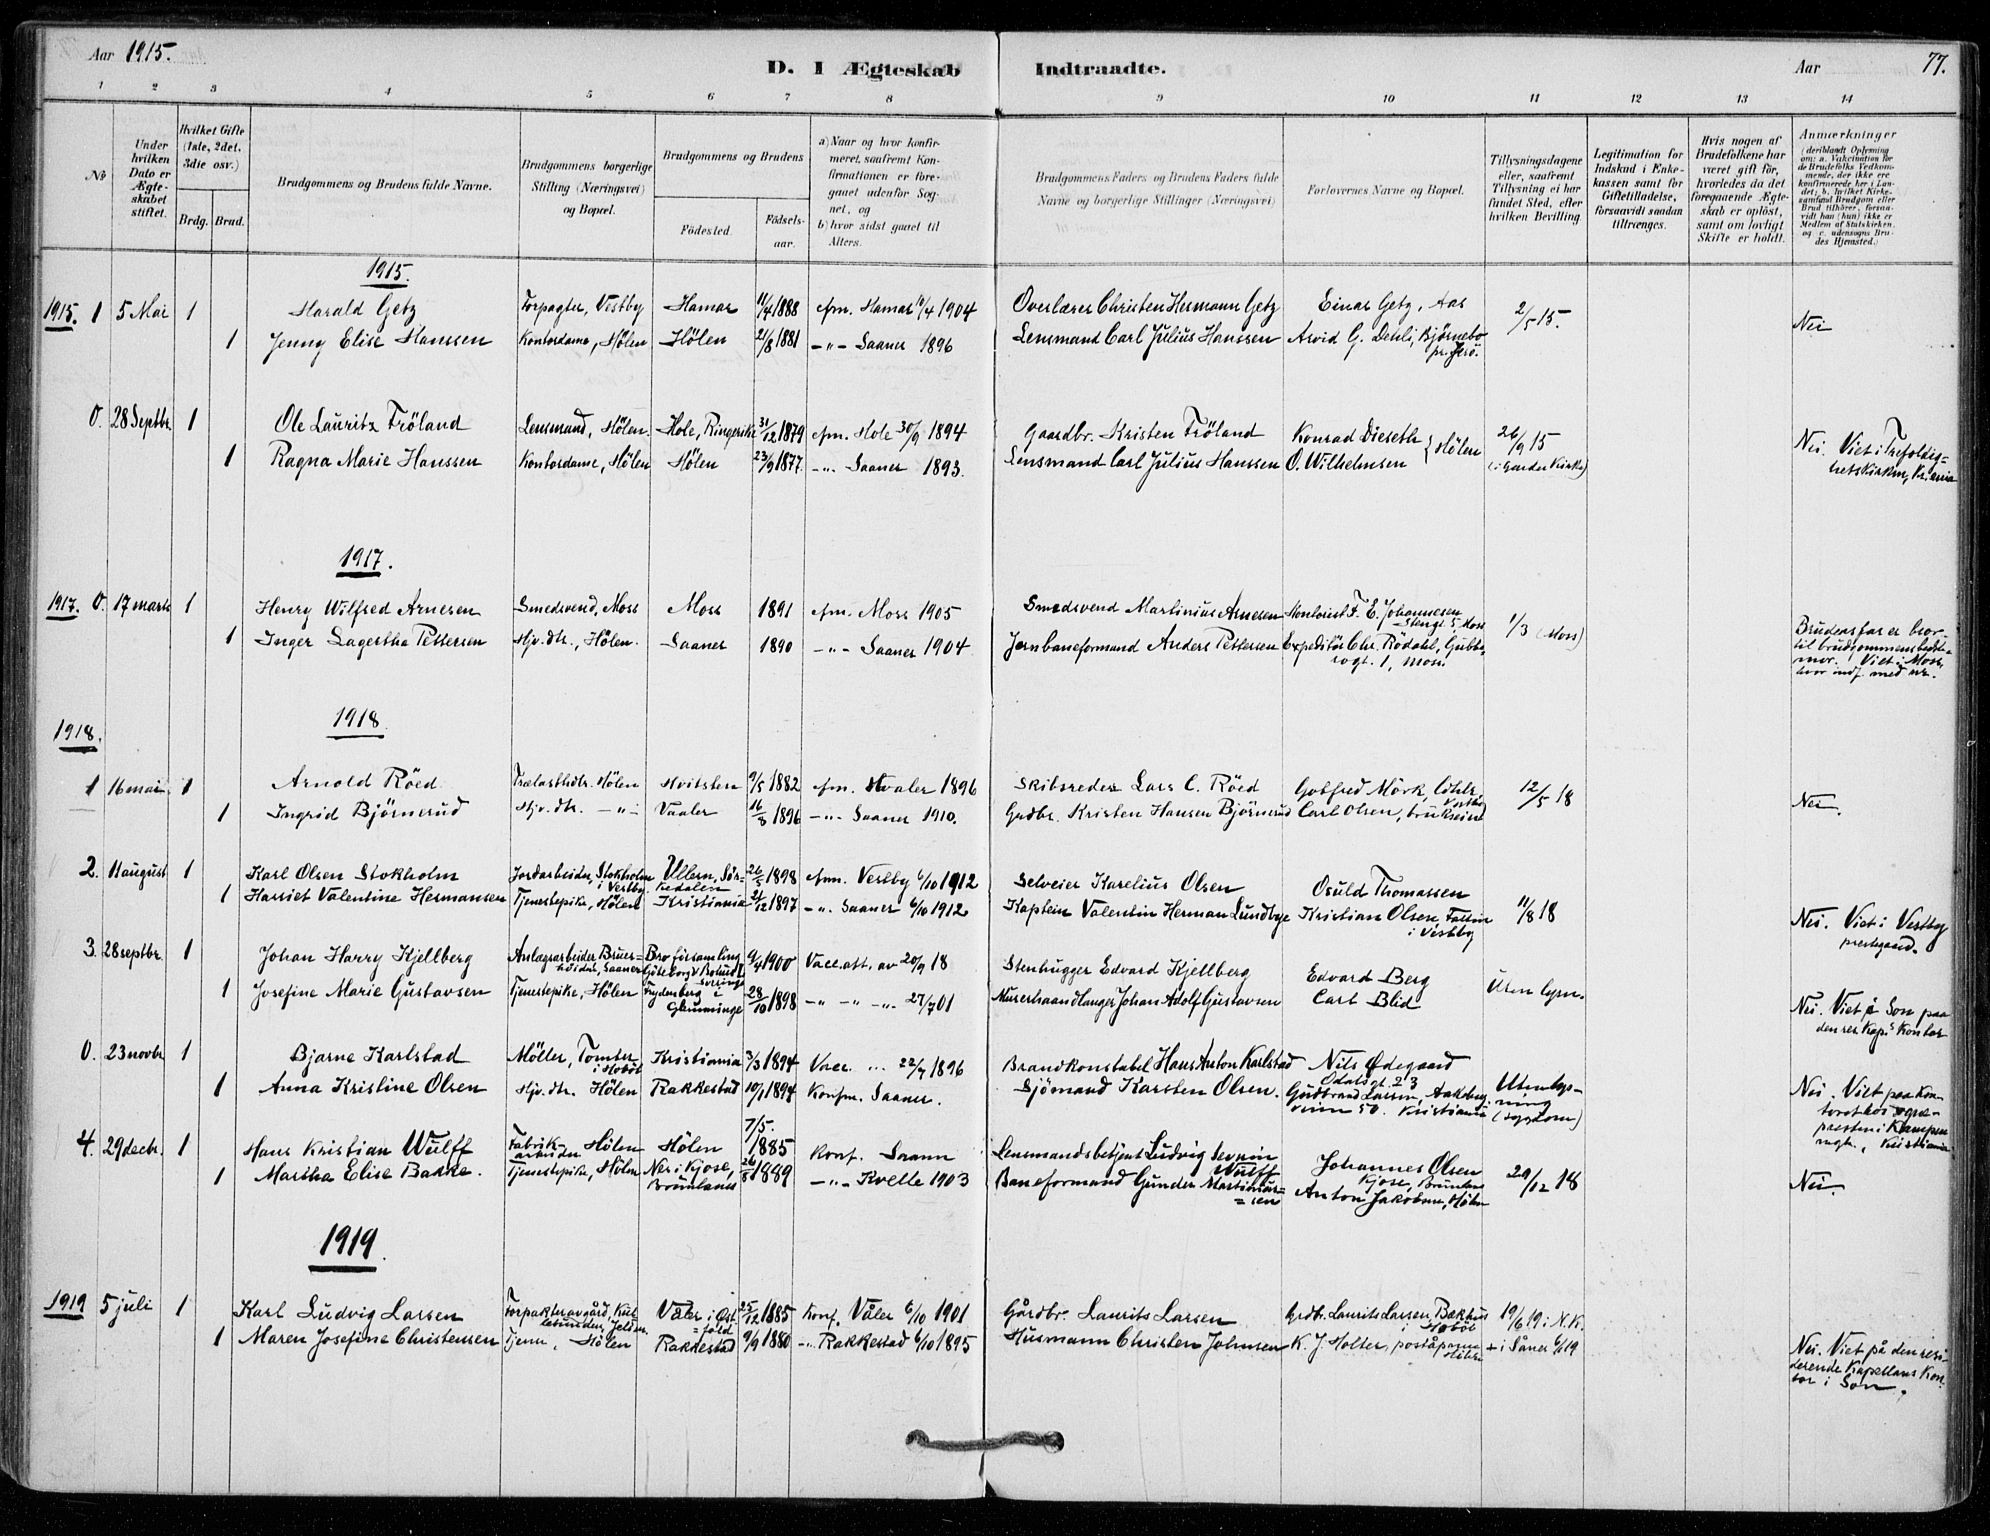 SAO, Vestby prestekontor Kirkebøker, F/Fe/L0001: Ministerialbok nr. V 1, 1878-1931, s. 77